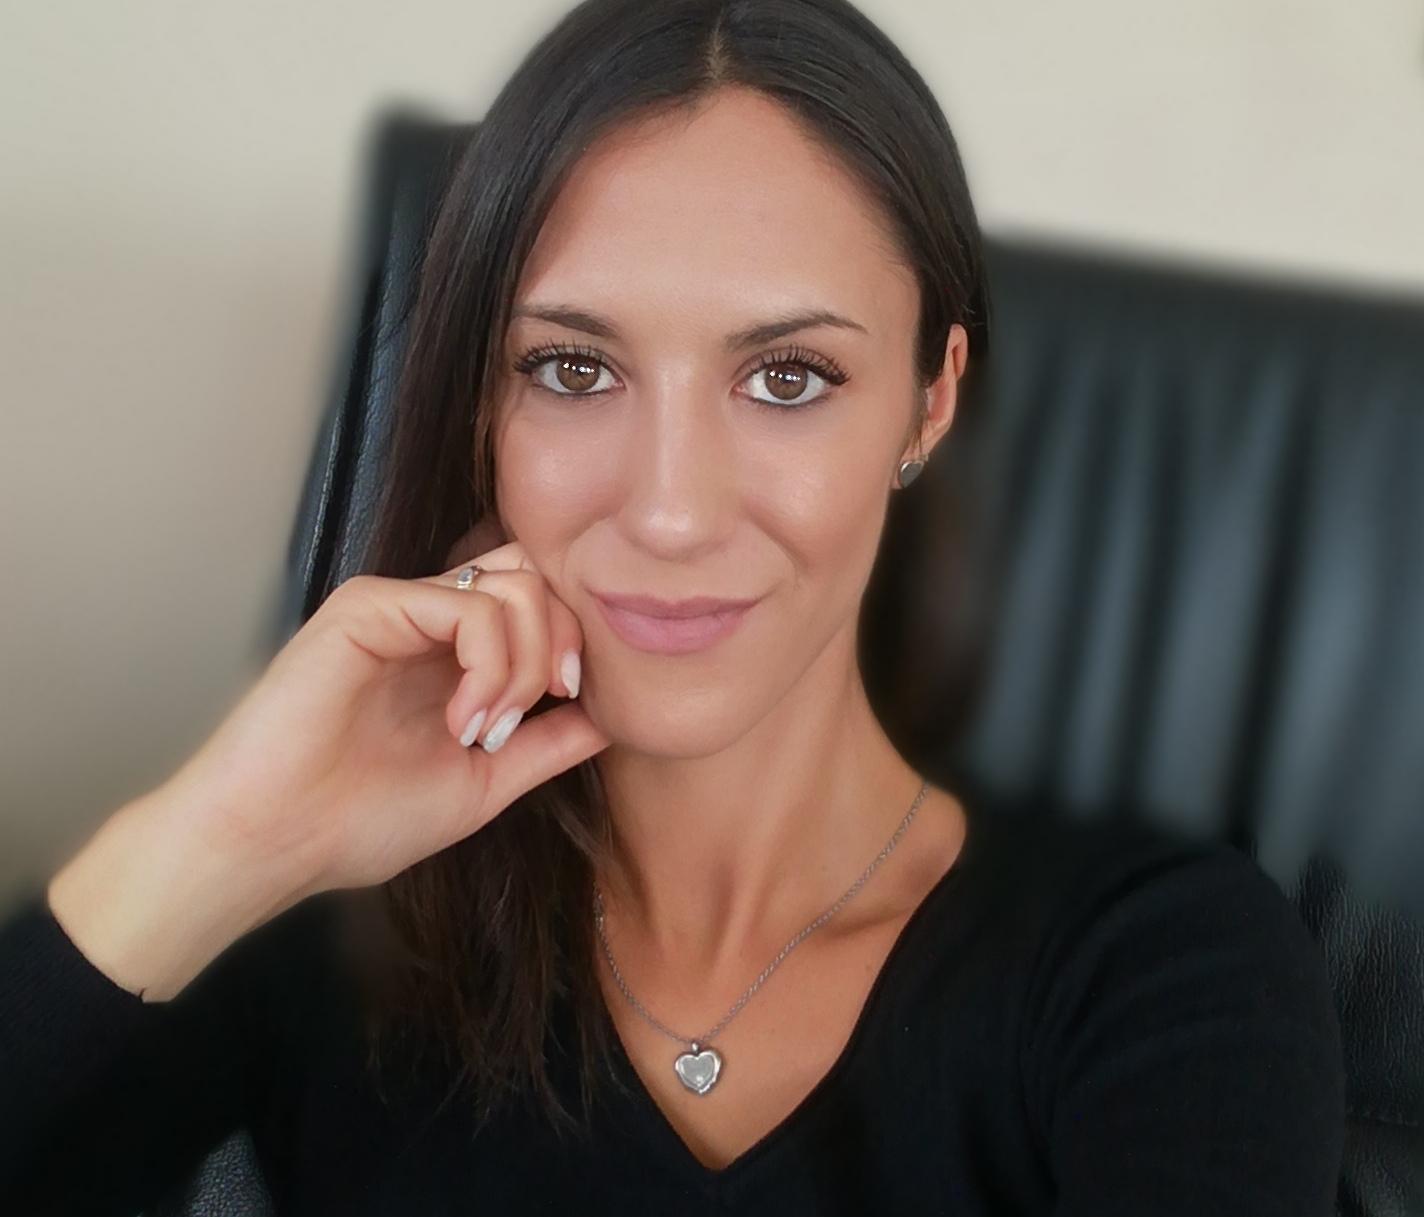 Martina Vimercati